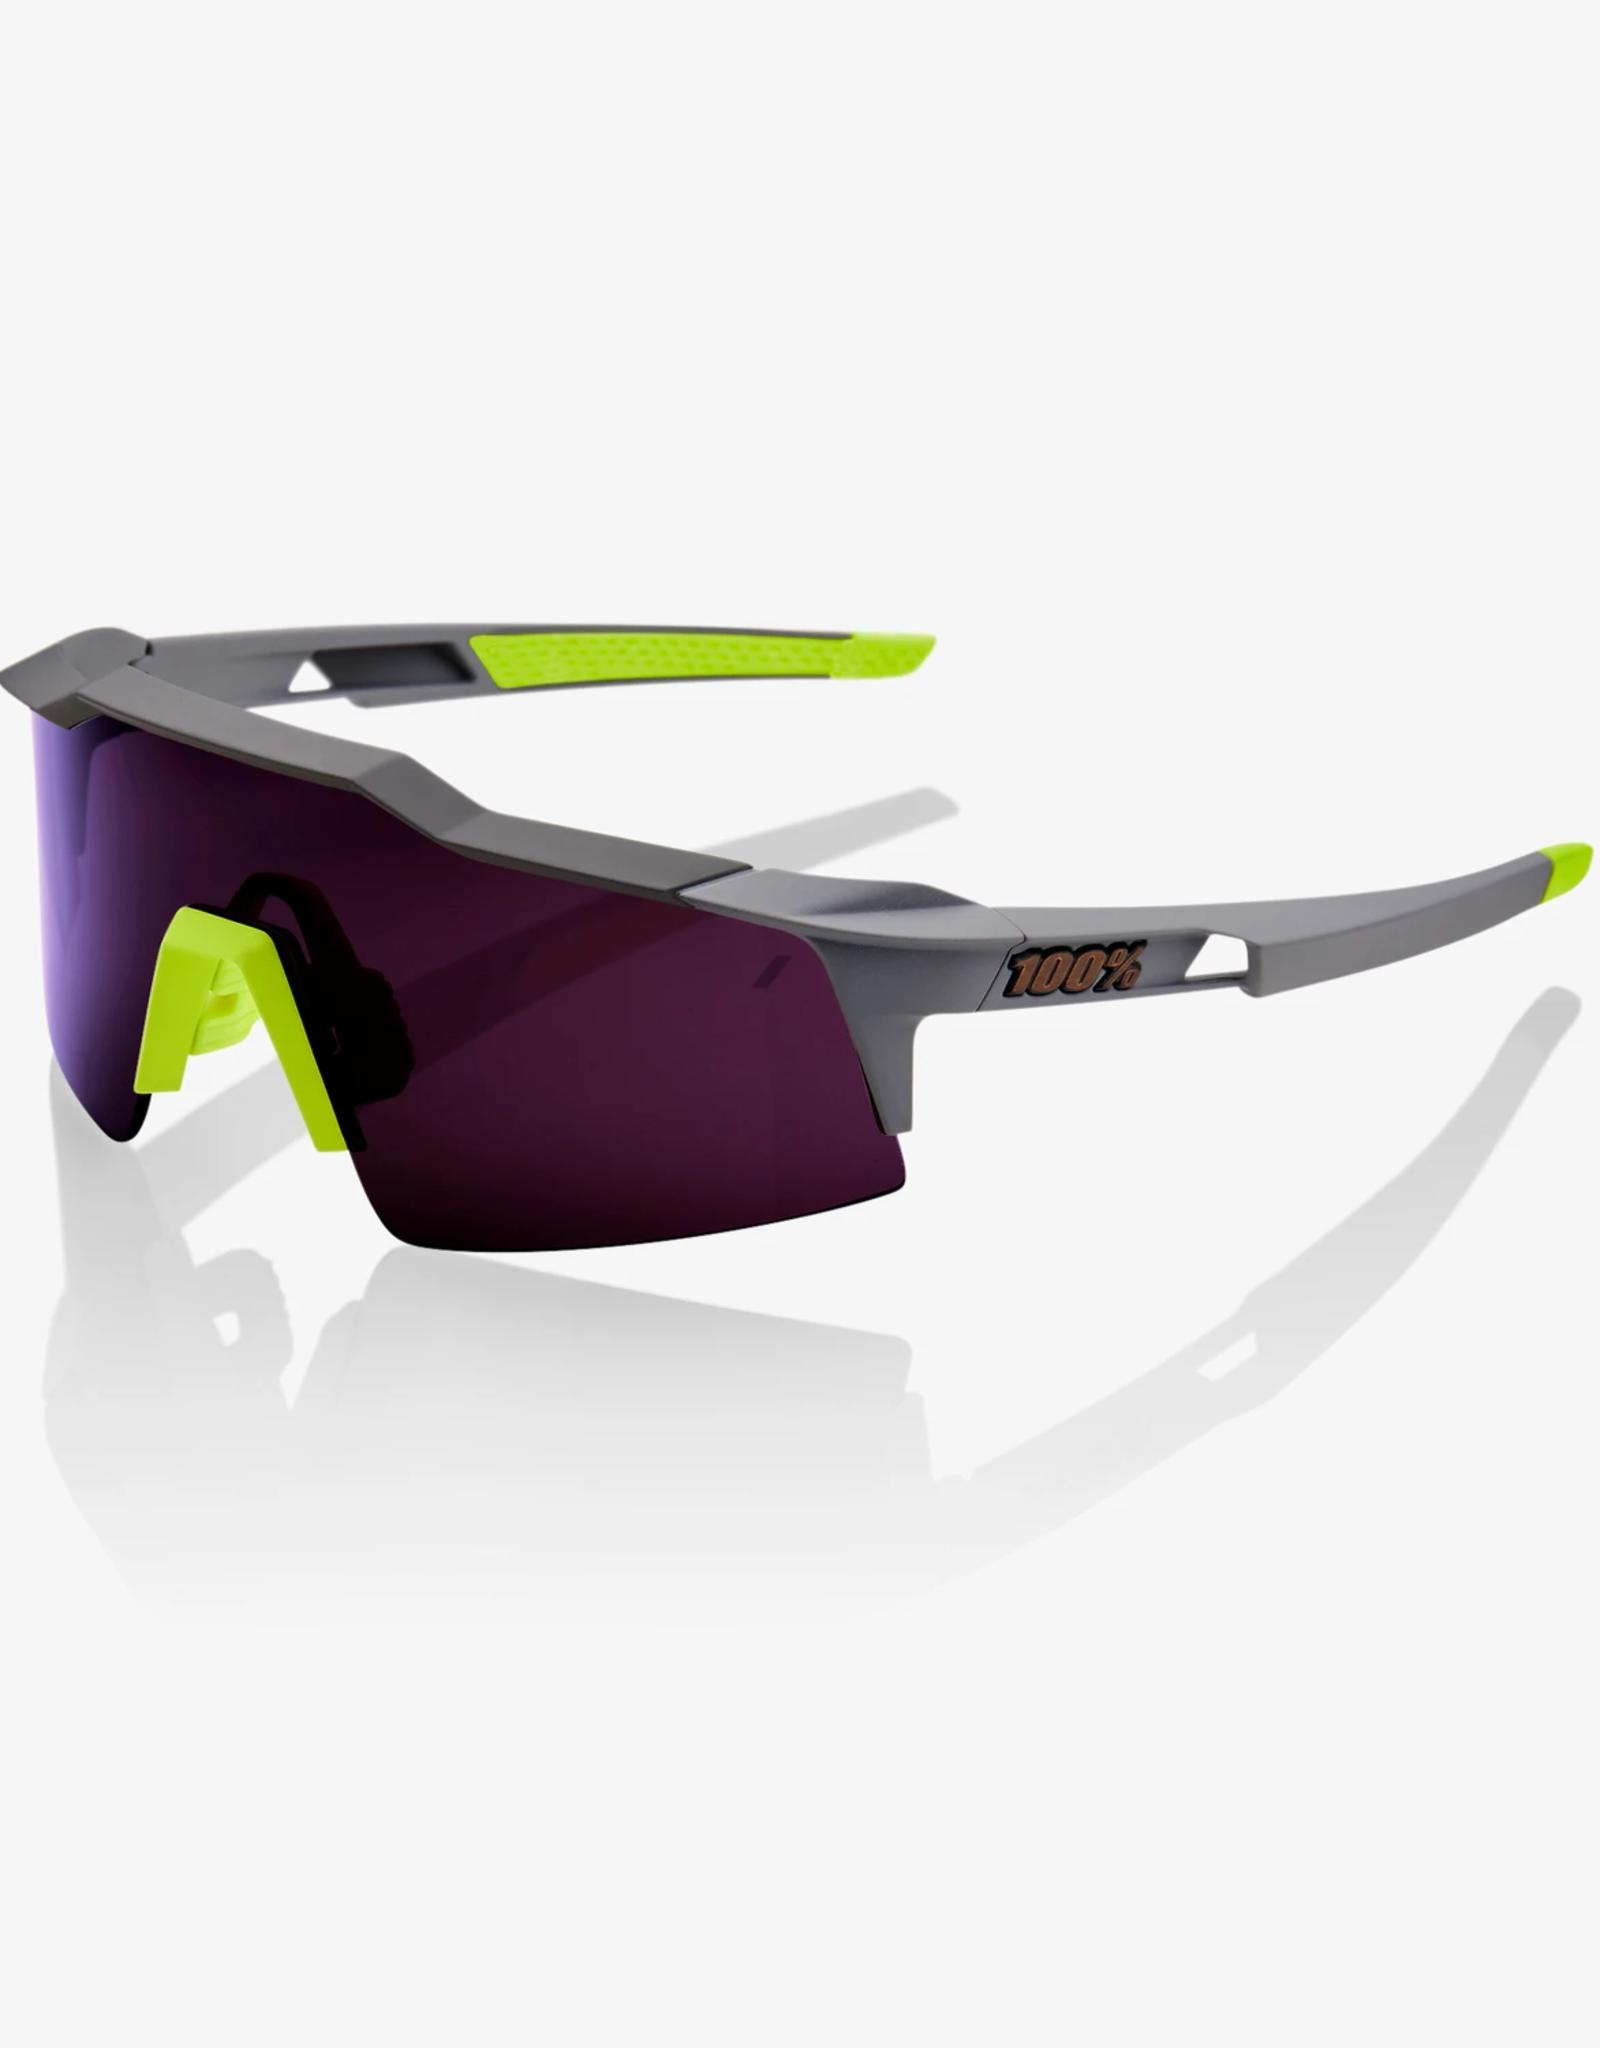 100 Percent LUNETTES 100% SpeedCraft Short (SL), Midnight Mauve frame - Dark Purple Lens